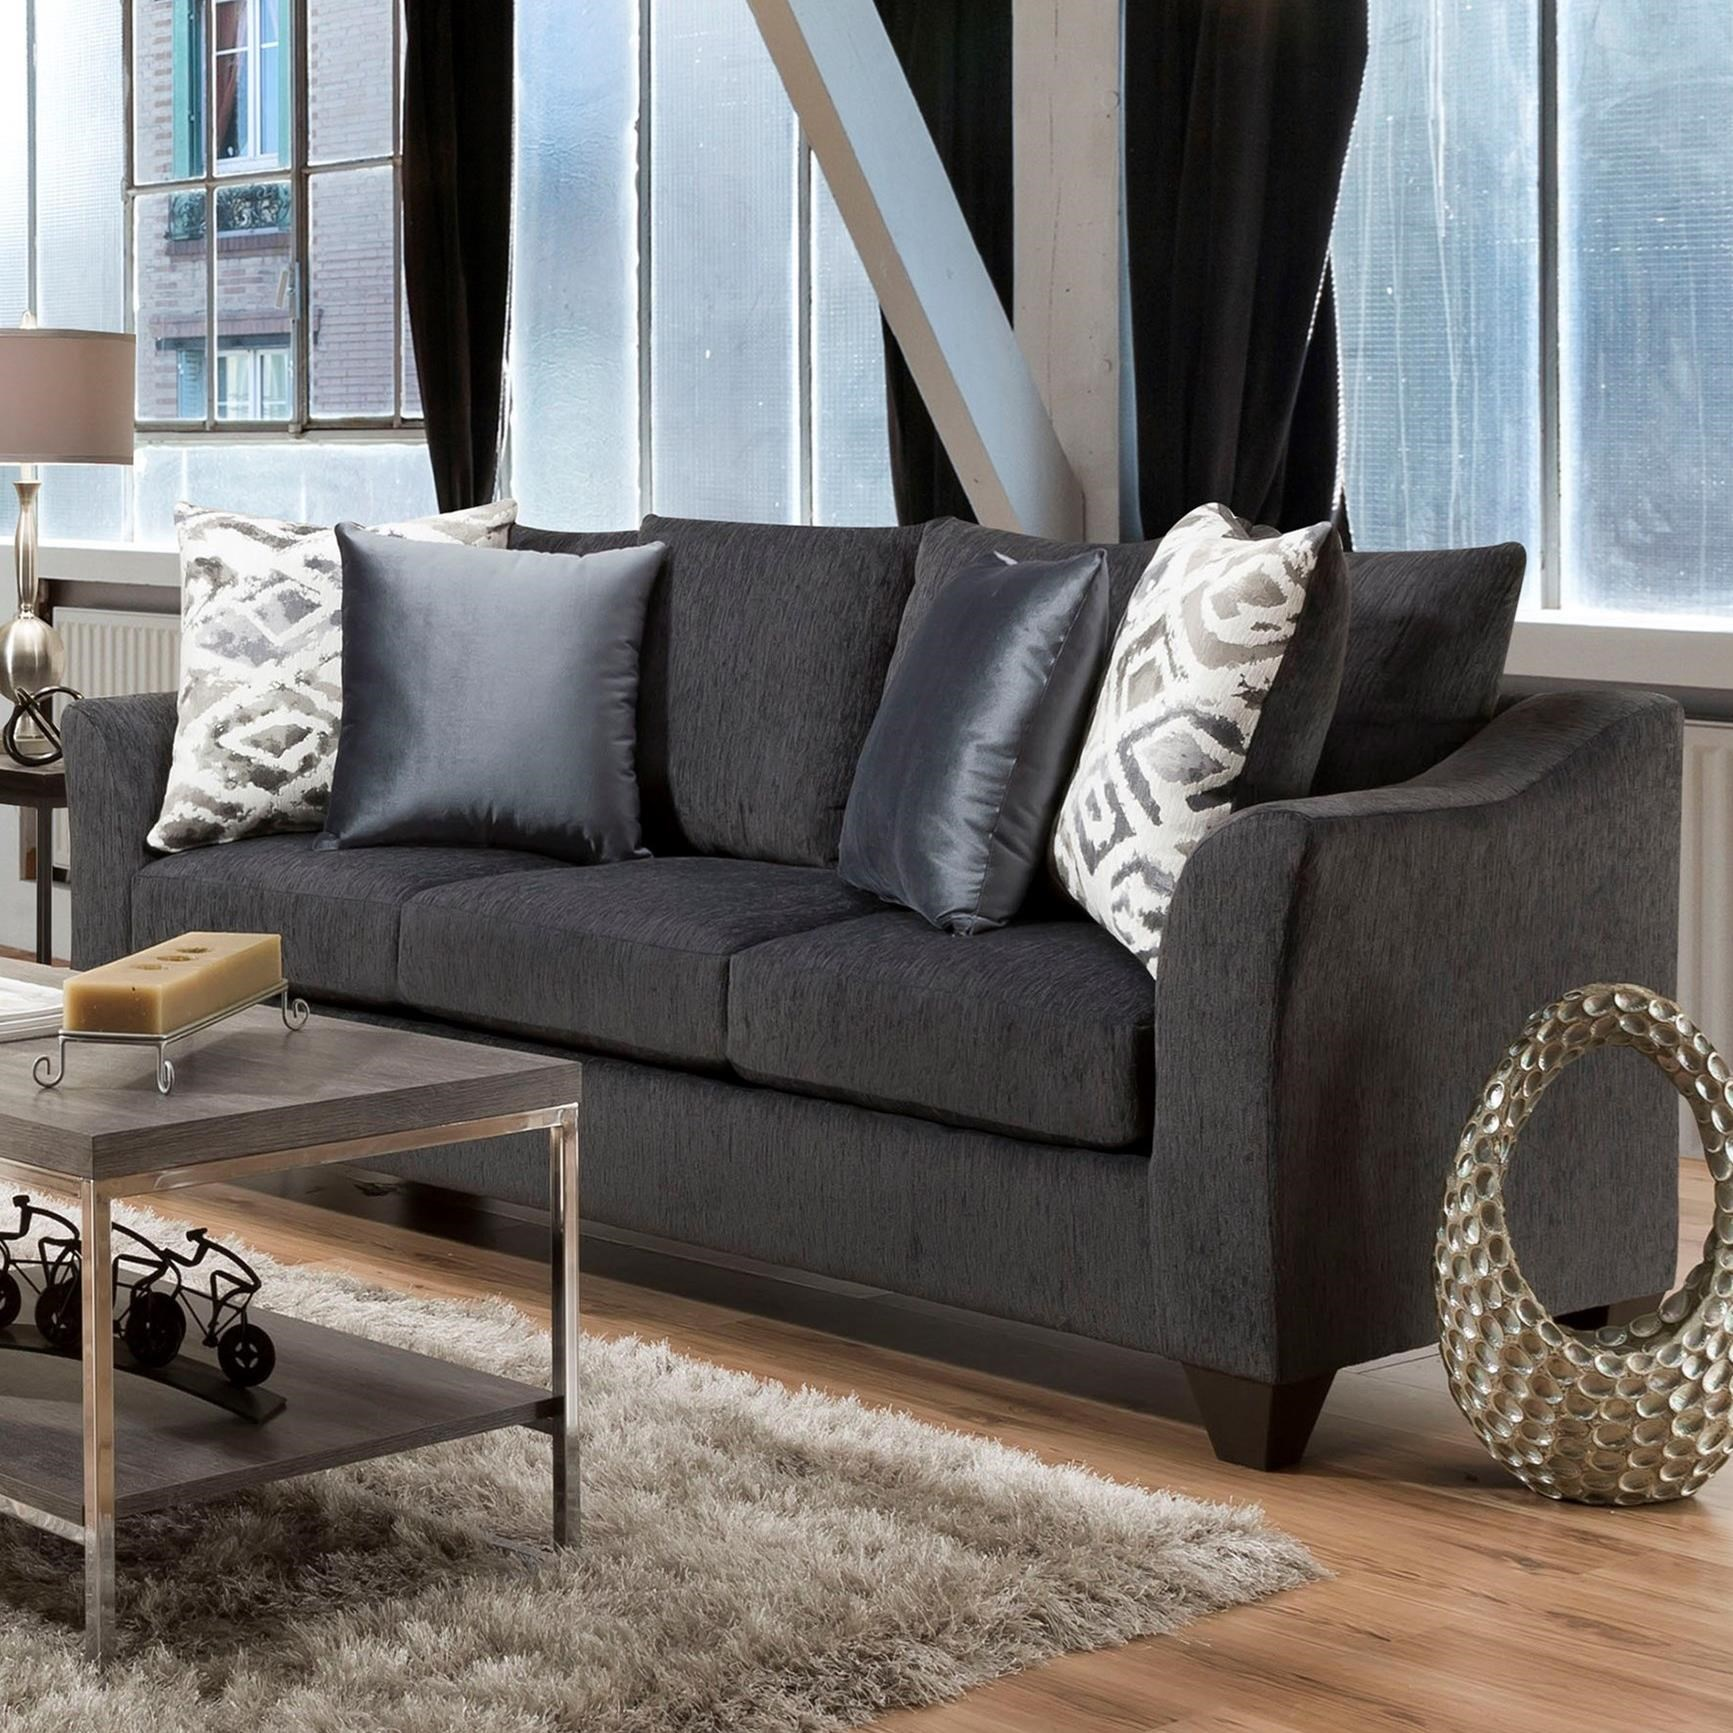 1370 Sofa by Peak Living at Prime Brothers Furniture